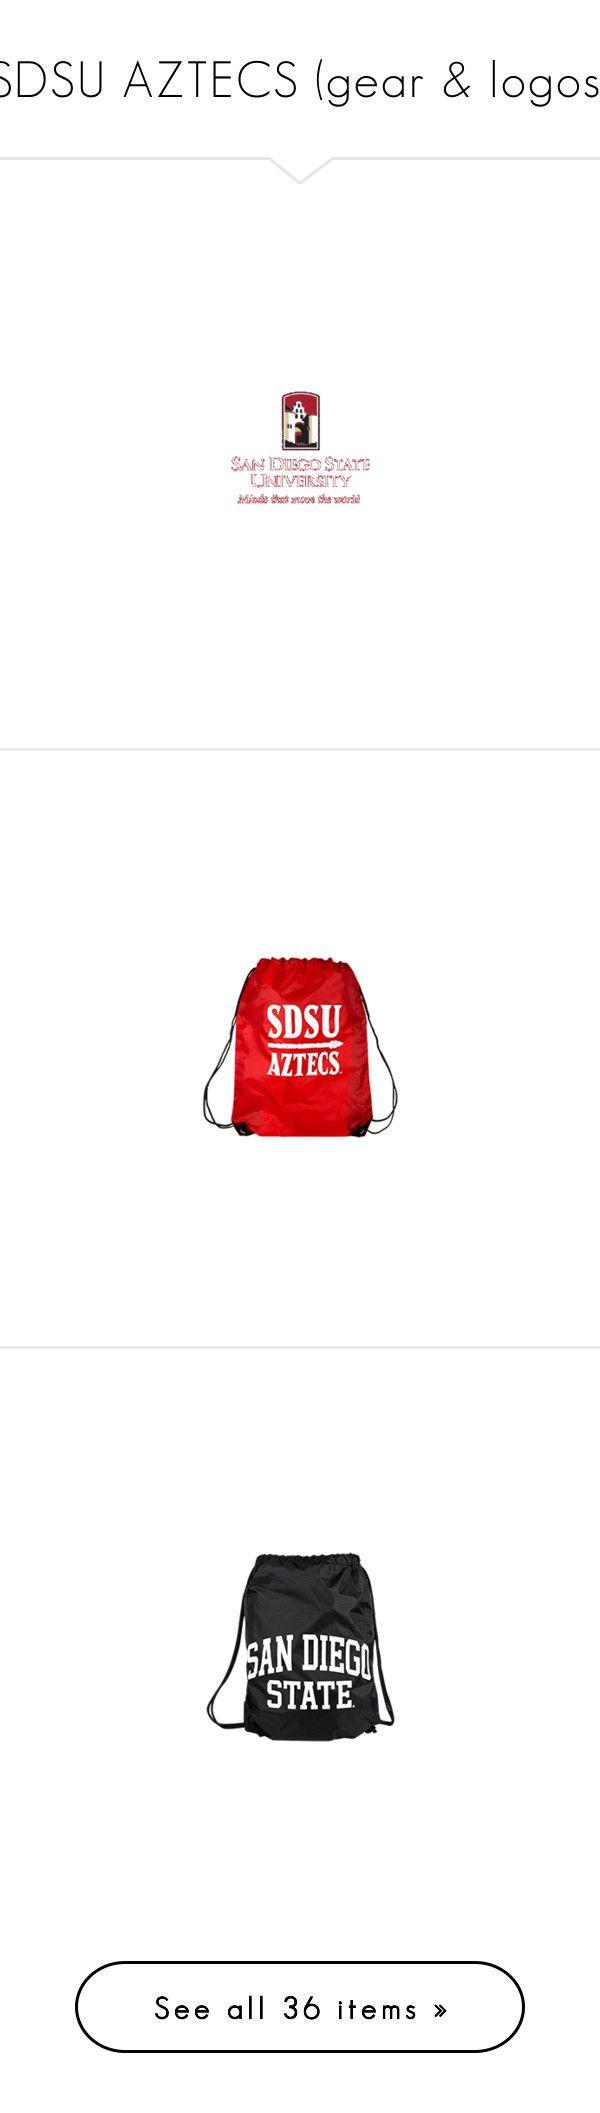 """SDSU AZTECS (gear & logos)"" by guitarbazaar ❤ liked on Polyvore featuring bags, handbags, aztec print bag, red drawstring bag, red purse, aztec print purse, aztec purse, drawstring bag, activewear and activewear shorts"